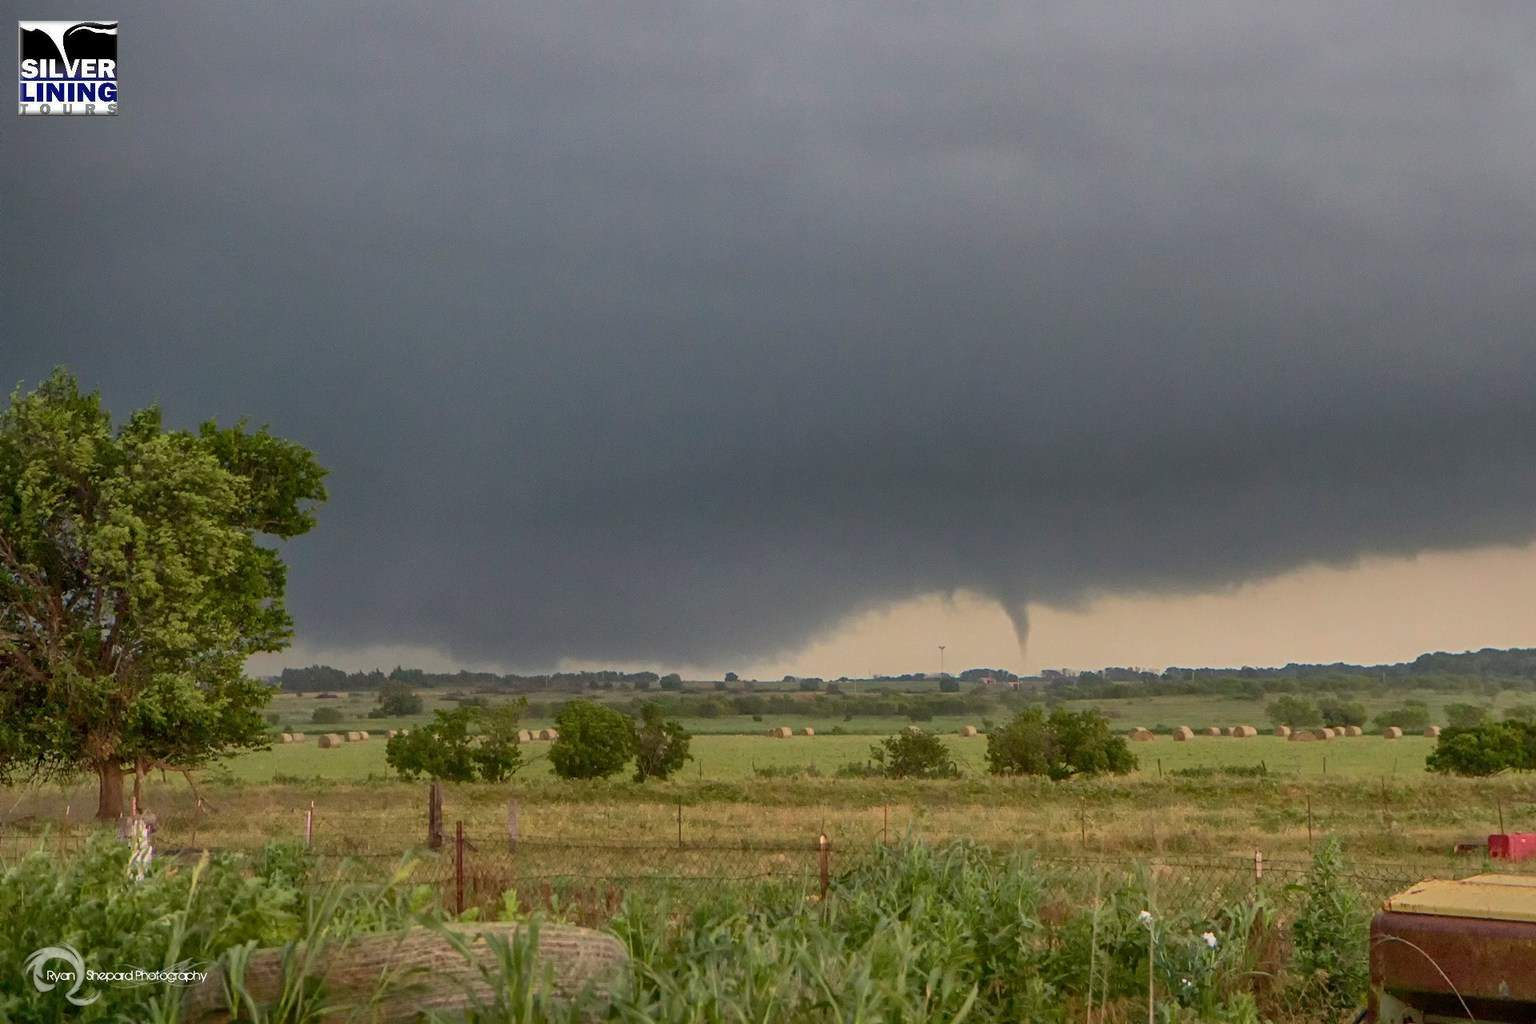 Tornado east of Terral, OK 5-19-15